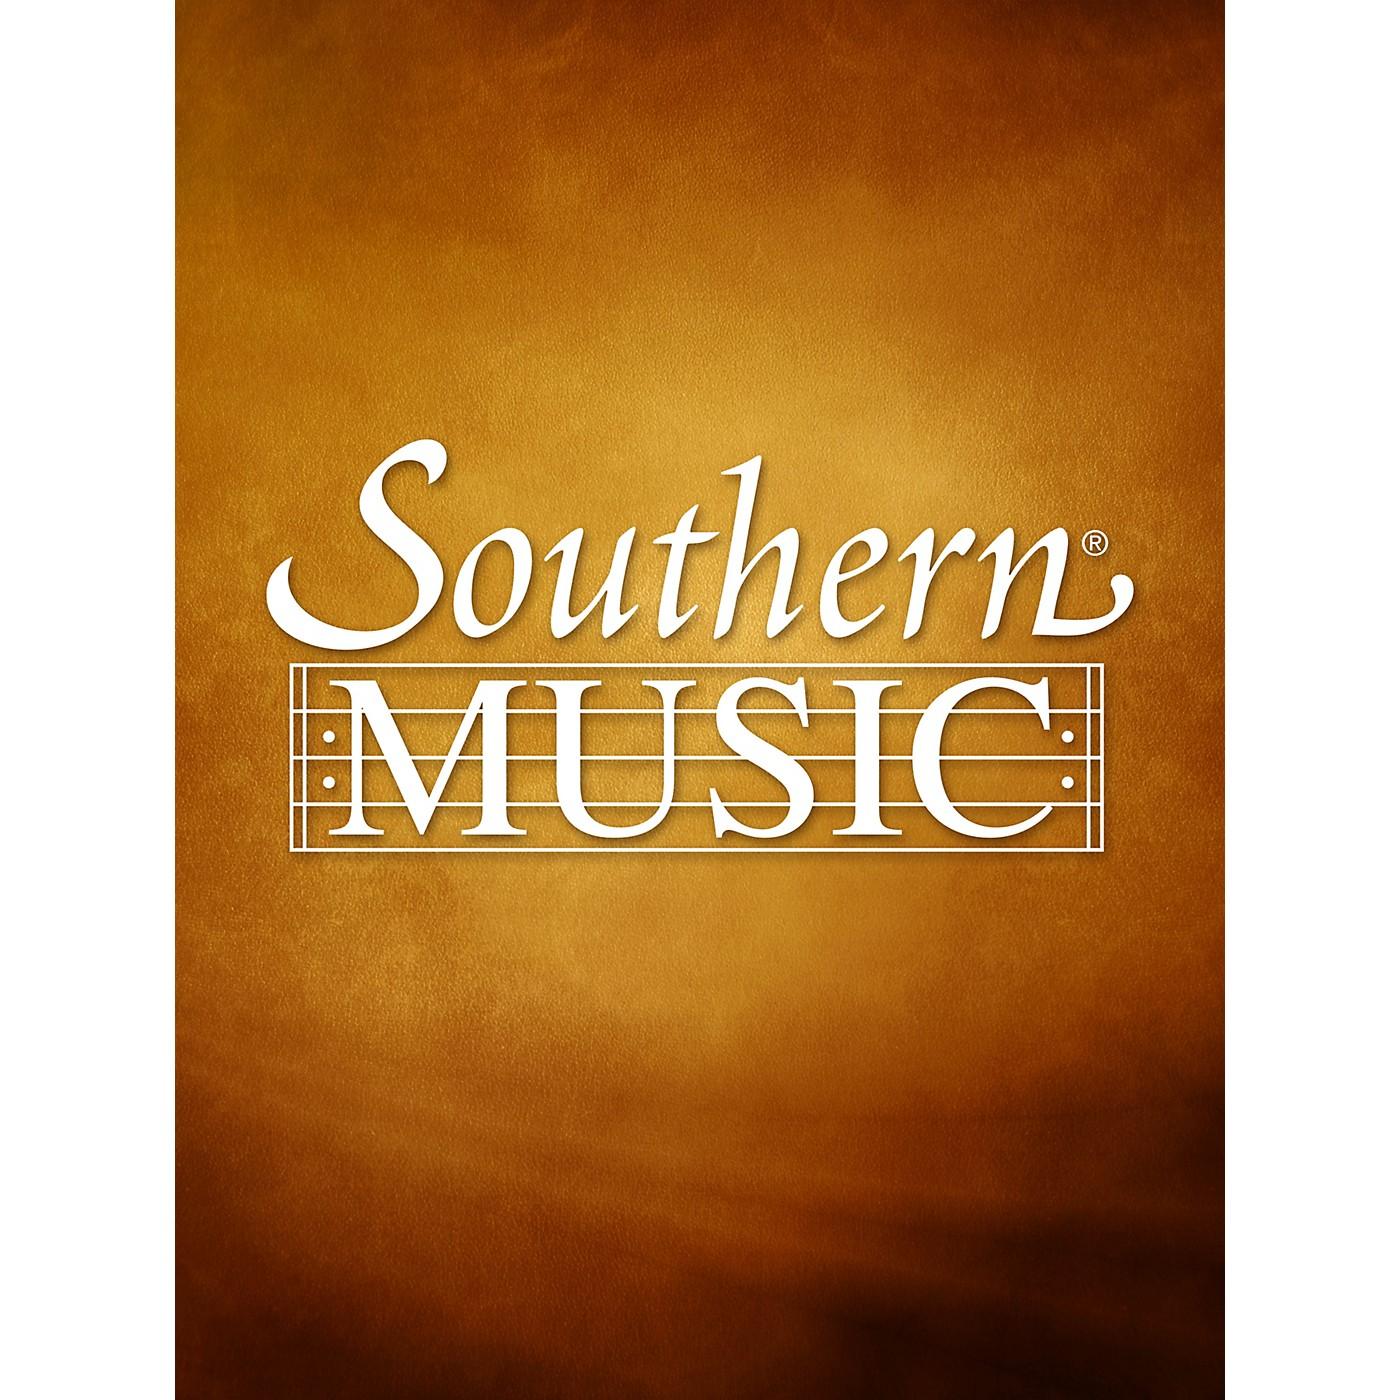 Southern Concert Etudes for Solo Tuba, Volume 2 (Solo Tuba (Unaccompanied)) Southern Music Series by Leroy Osmon thumbnail